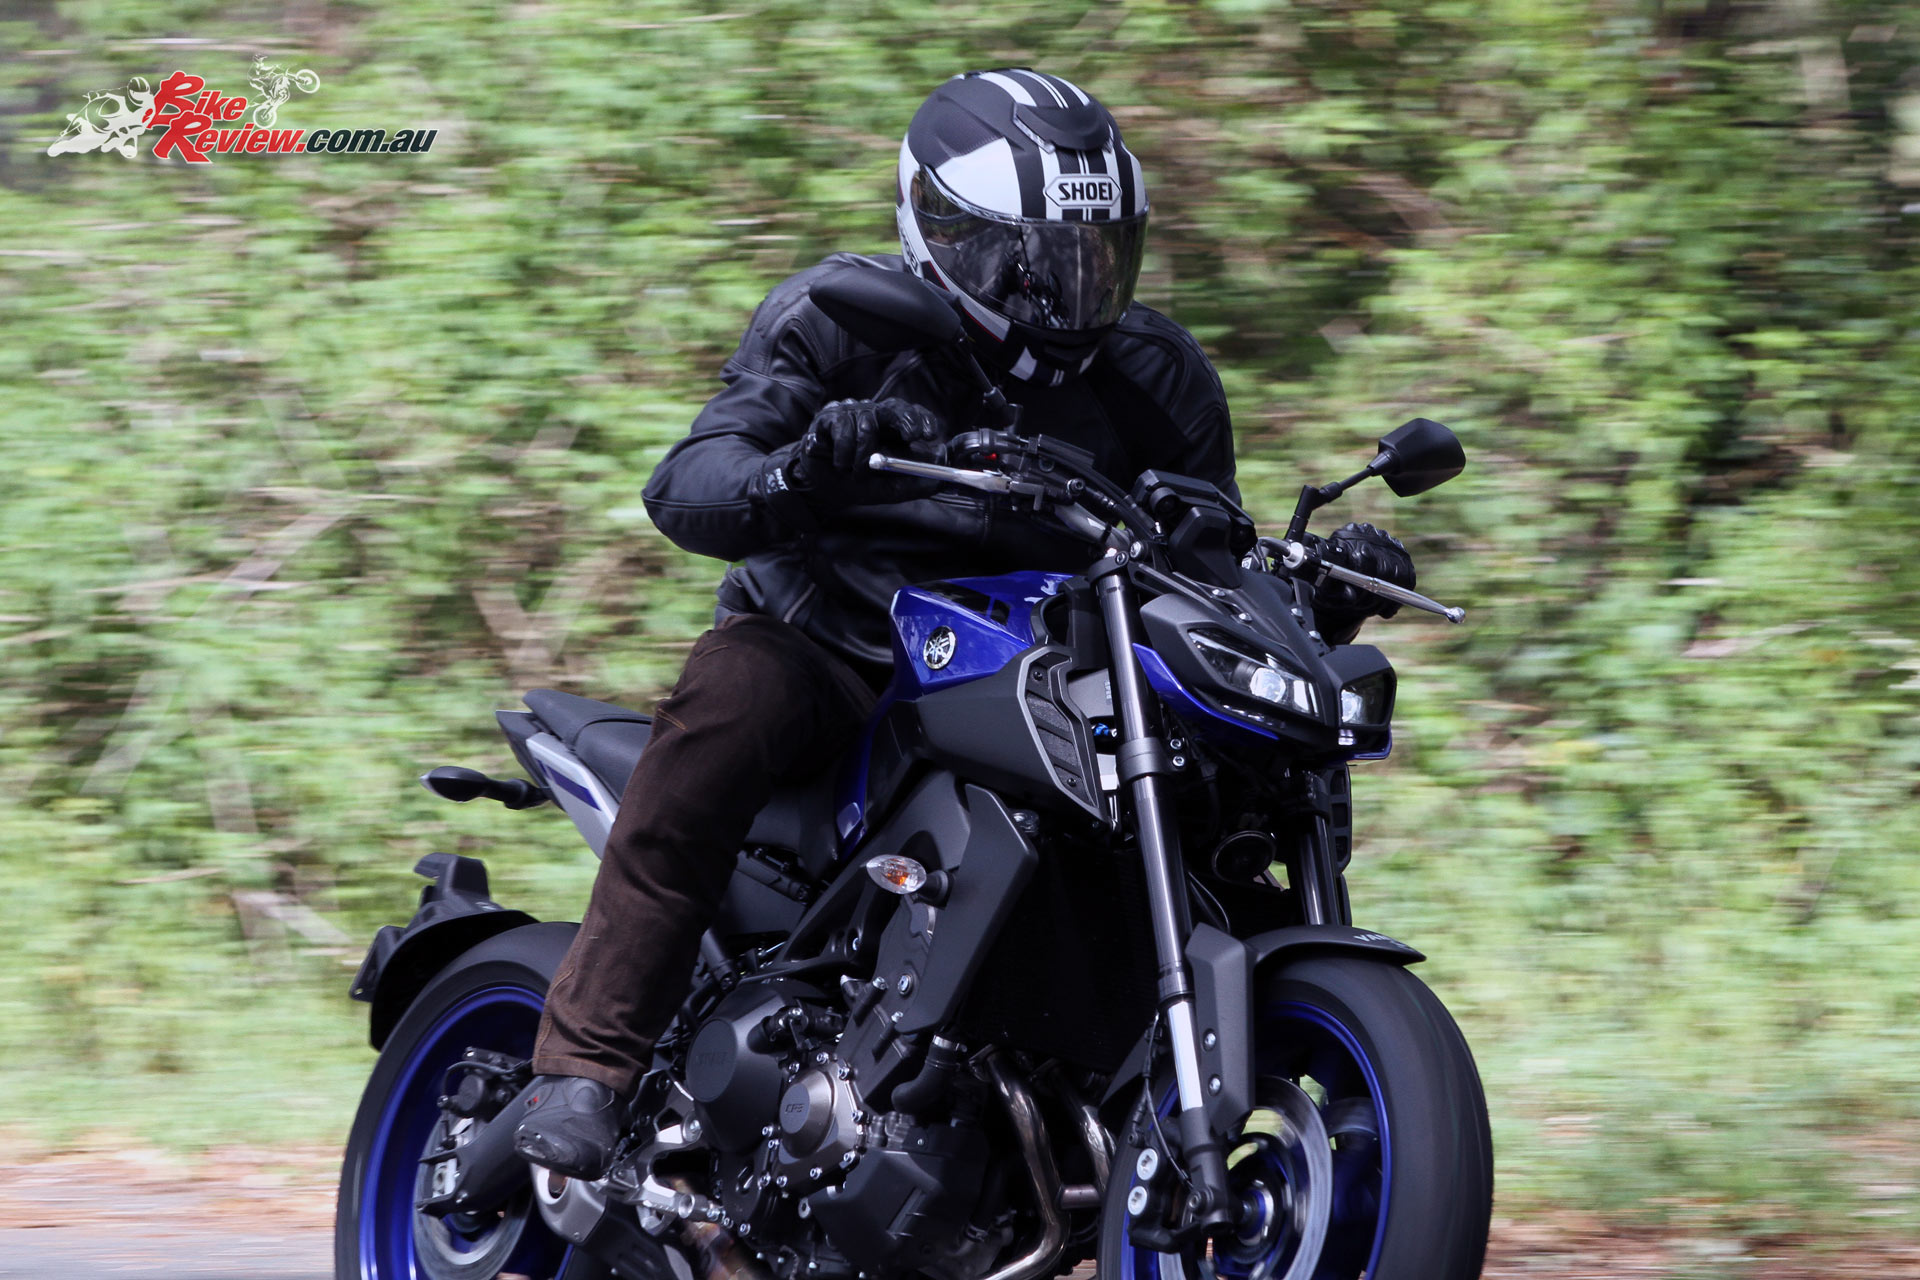 111020-2021-Yamaha-MT-09-SP_Raven_A02 - Motorcycle.com